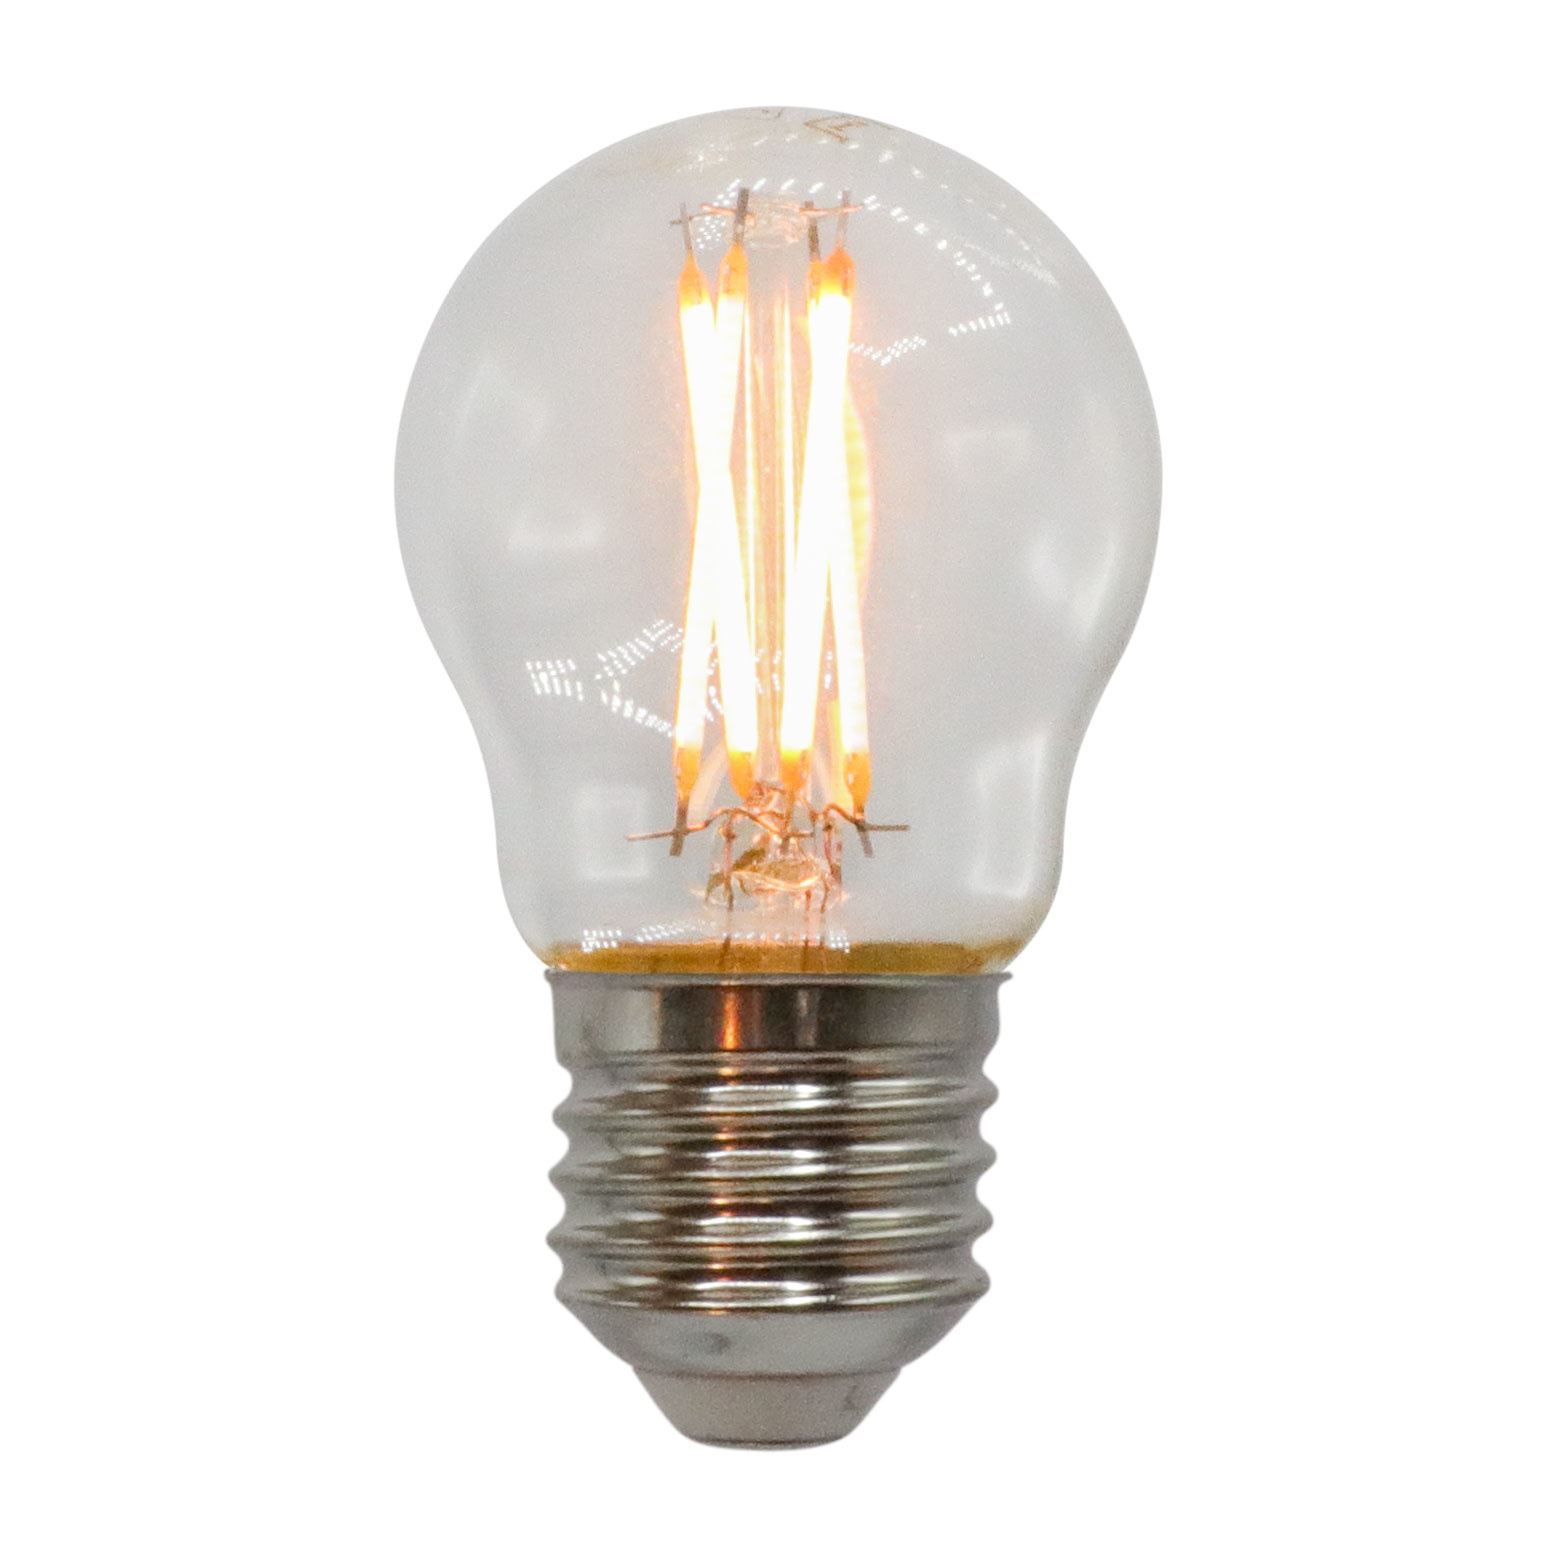 Dim-to-warm lampen